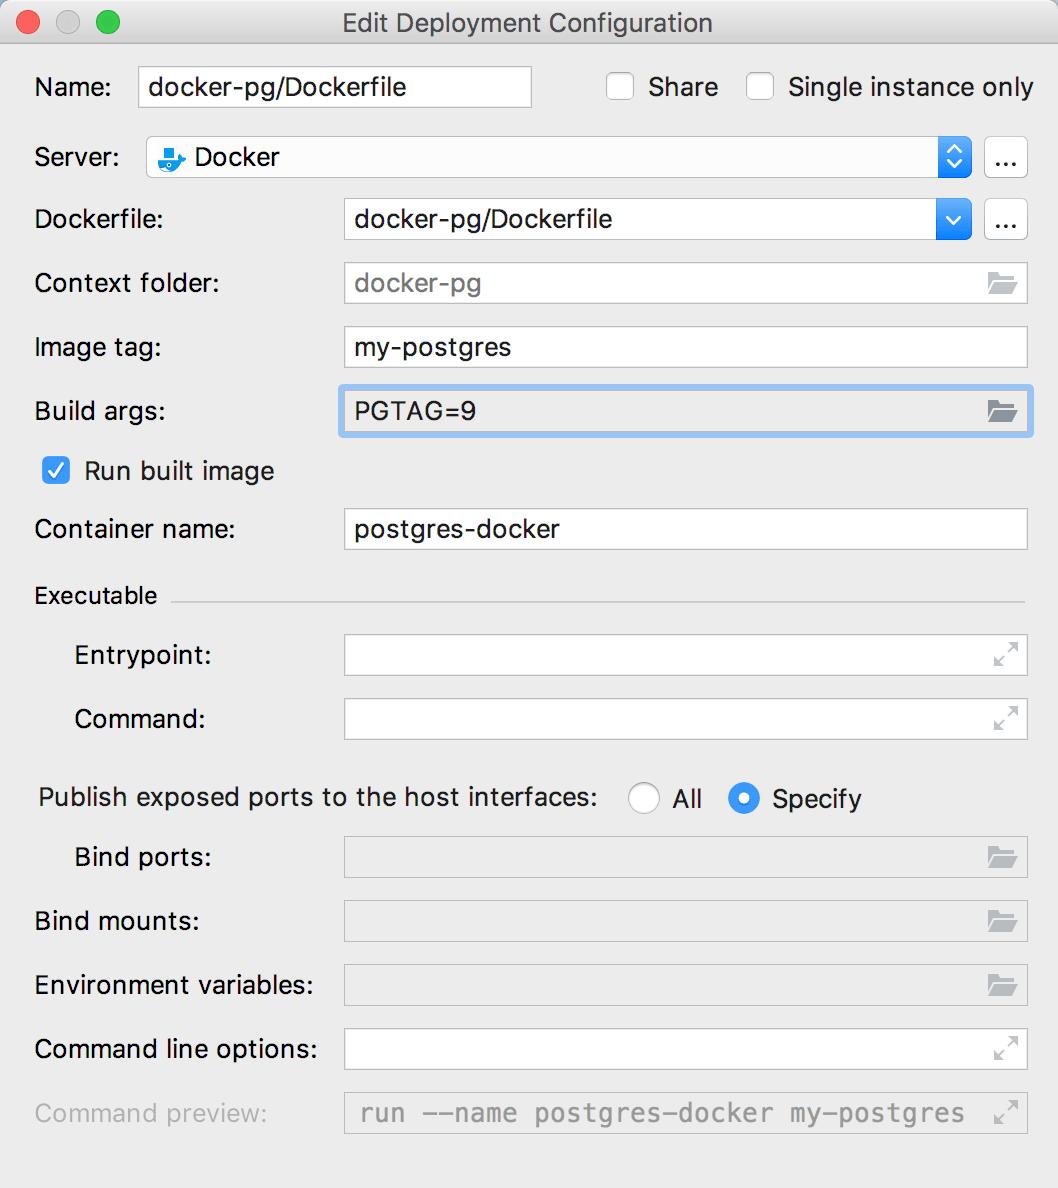 The Edit Deployment Configuration dialog with build-time arguments